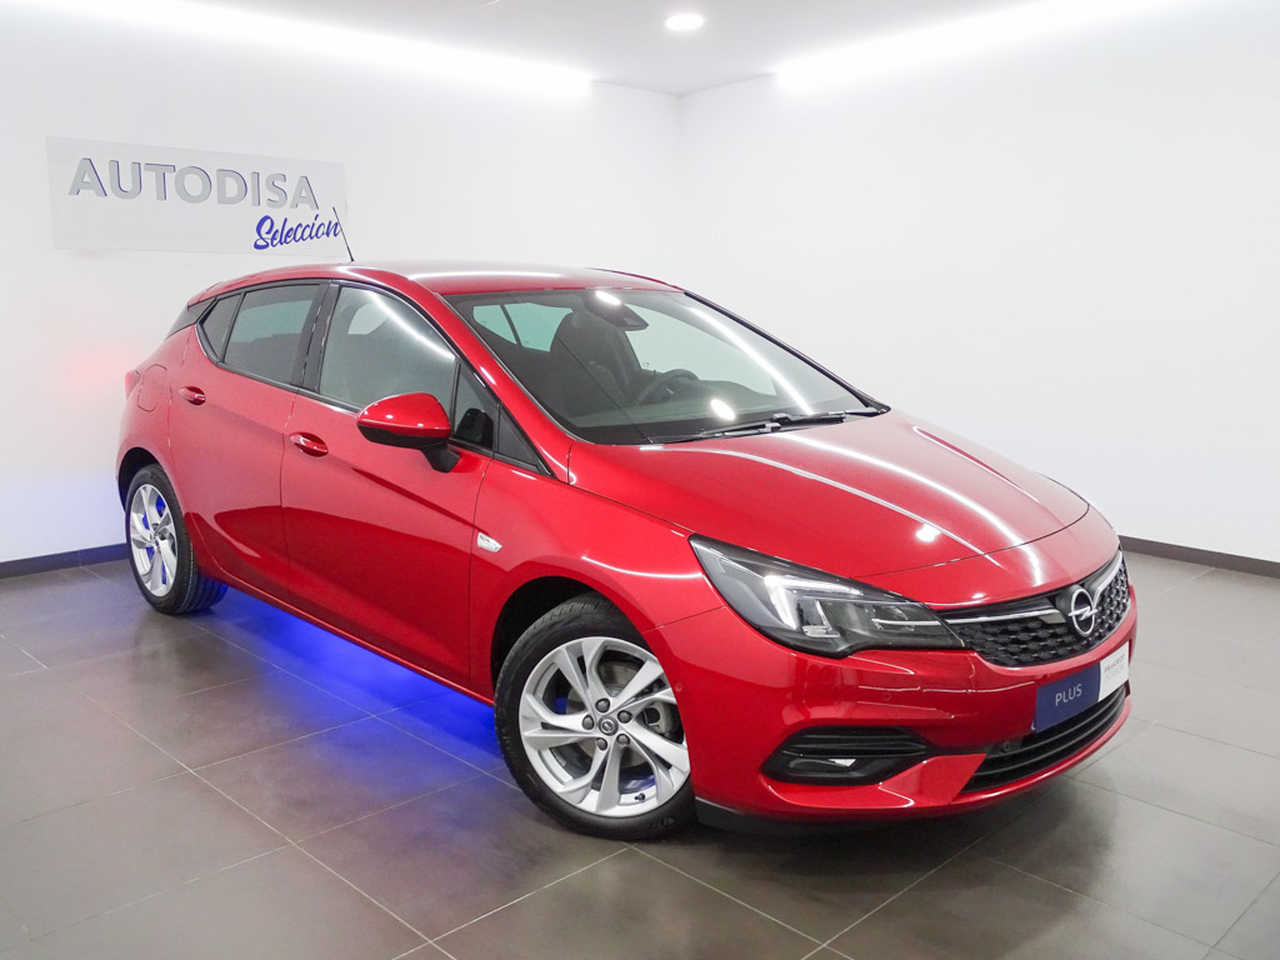 Array Opel Astra 2021 Diésel por 17.995€ en Valencia